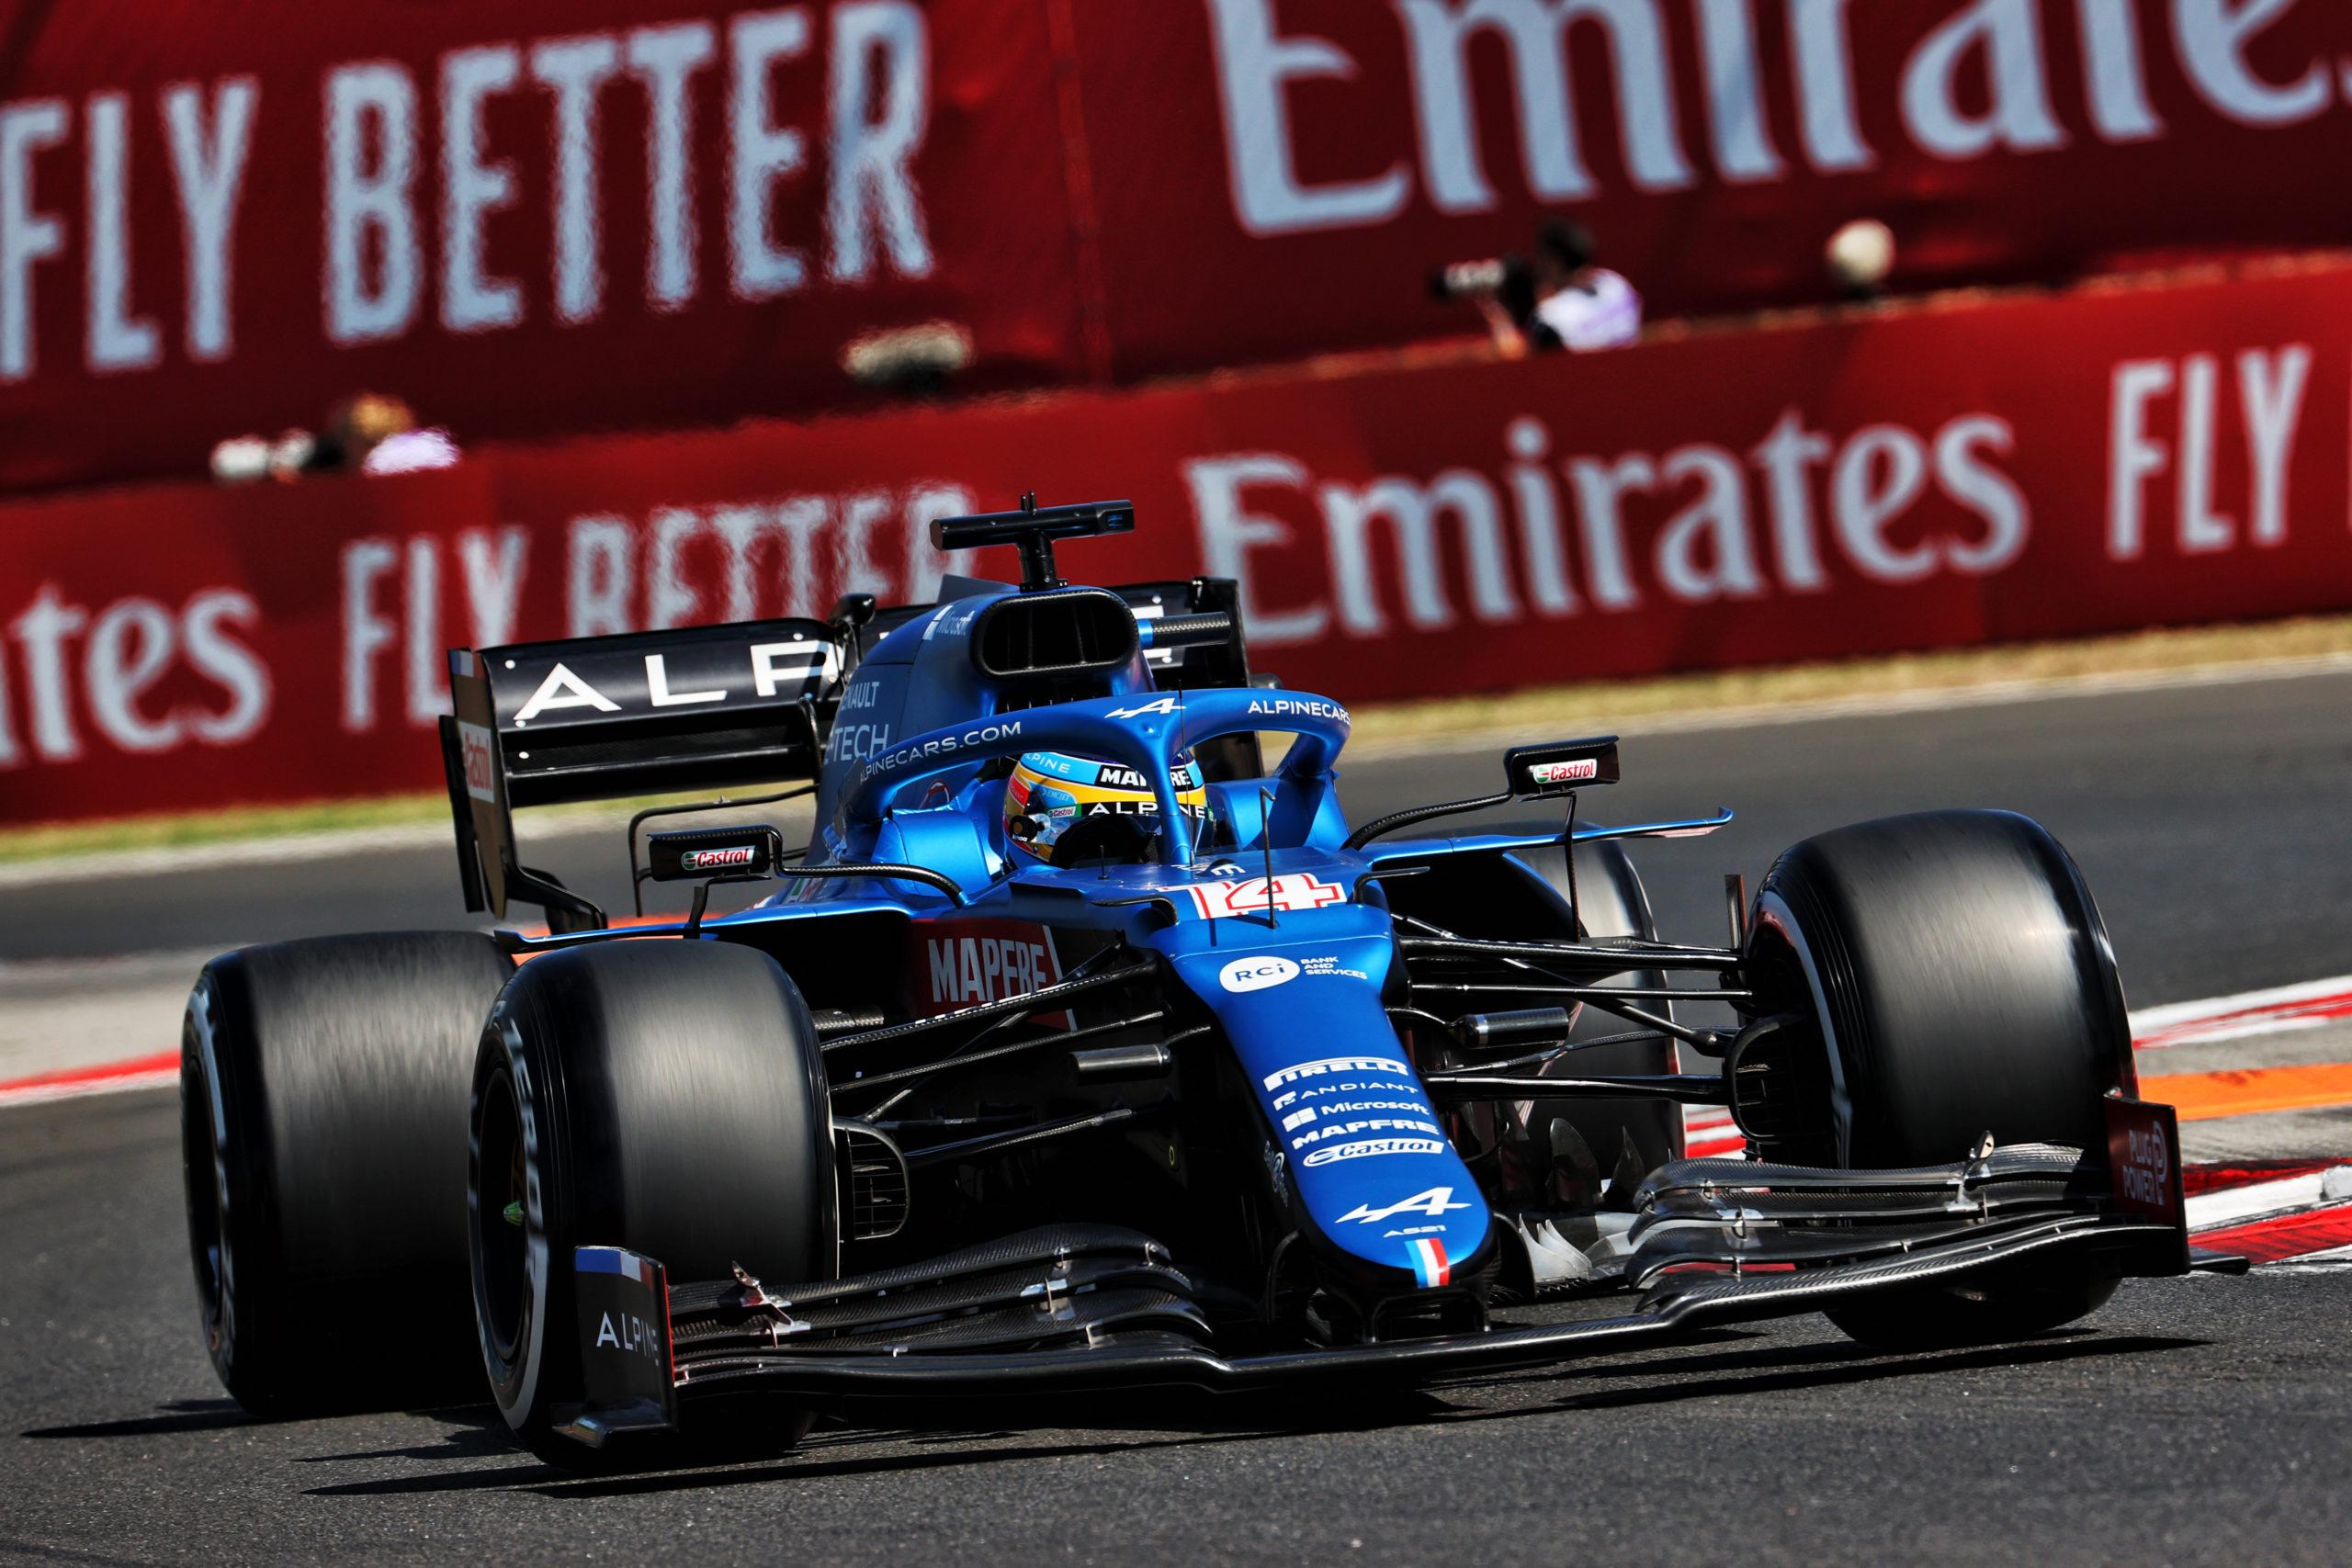 Fernando Alonso (ESP) Alpine F1 Team A521, F1 Grand Prix of Hungary at Hungaroring on July 30, 2021